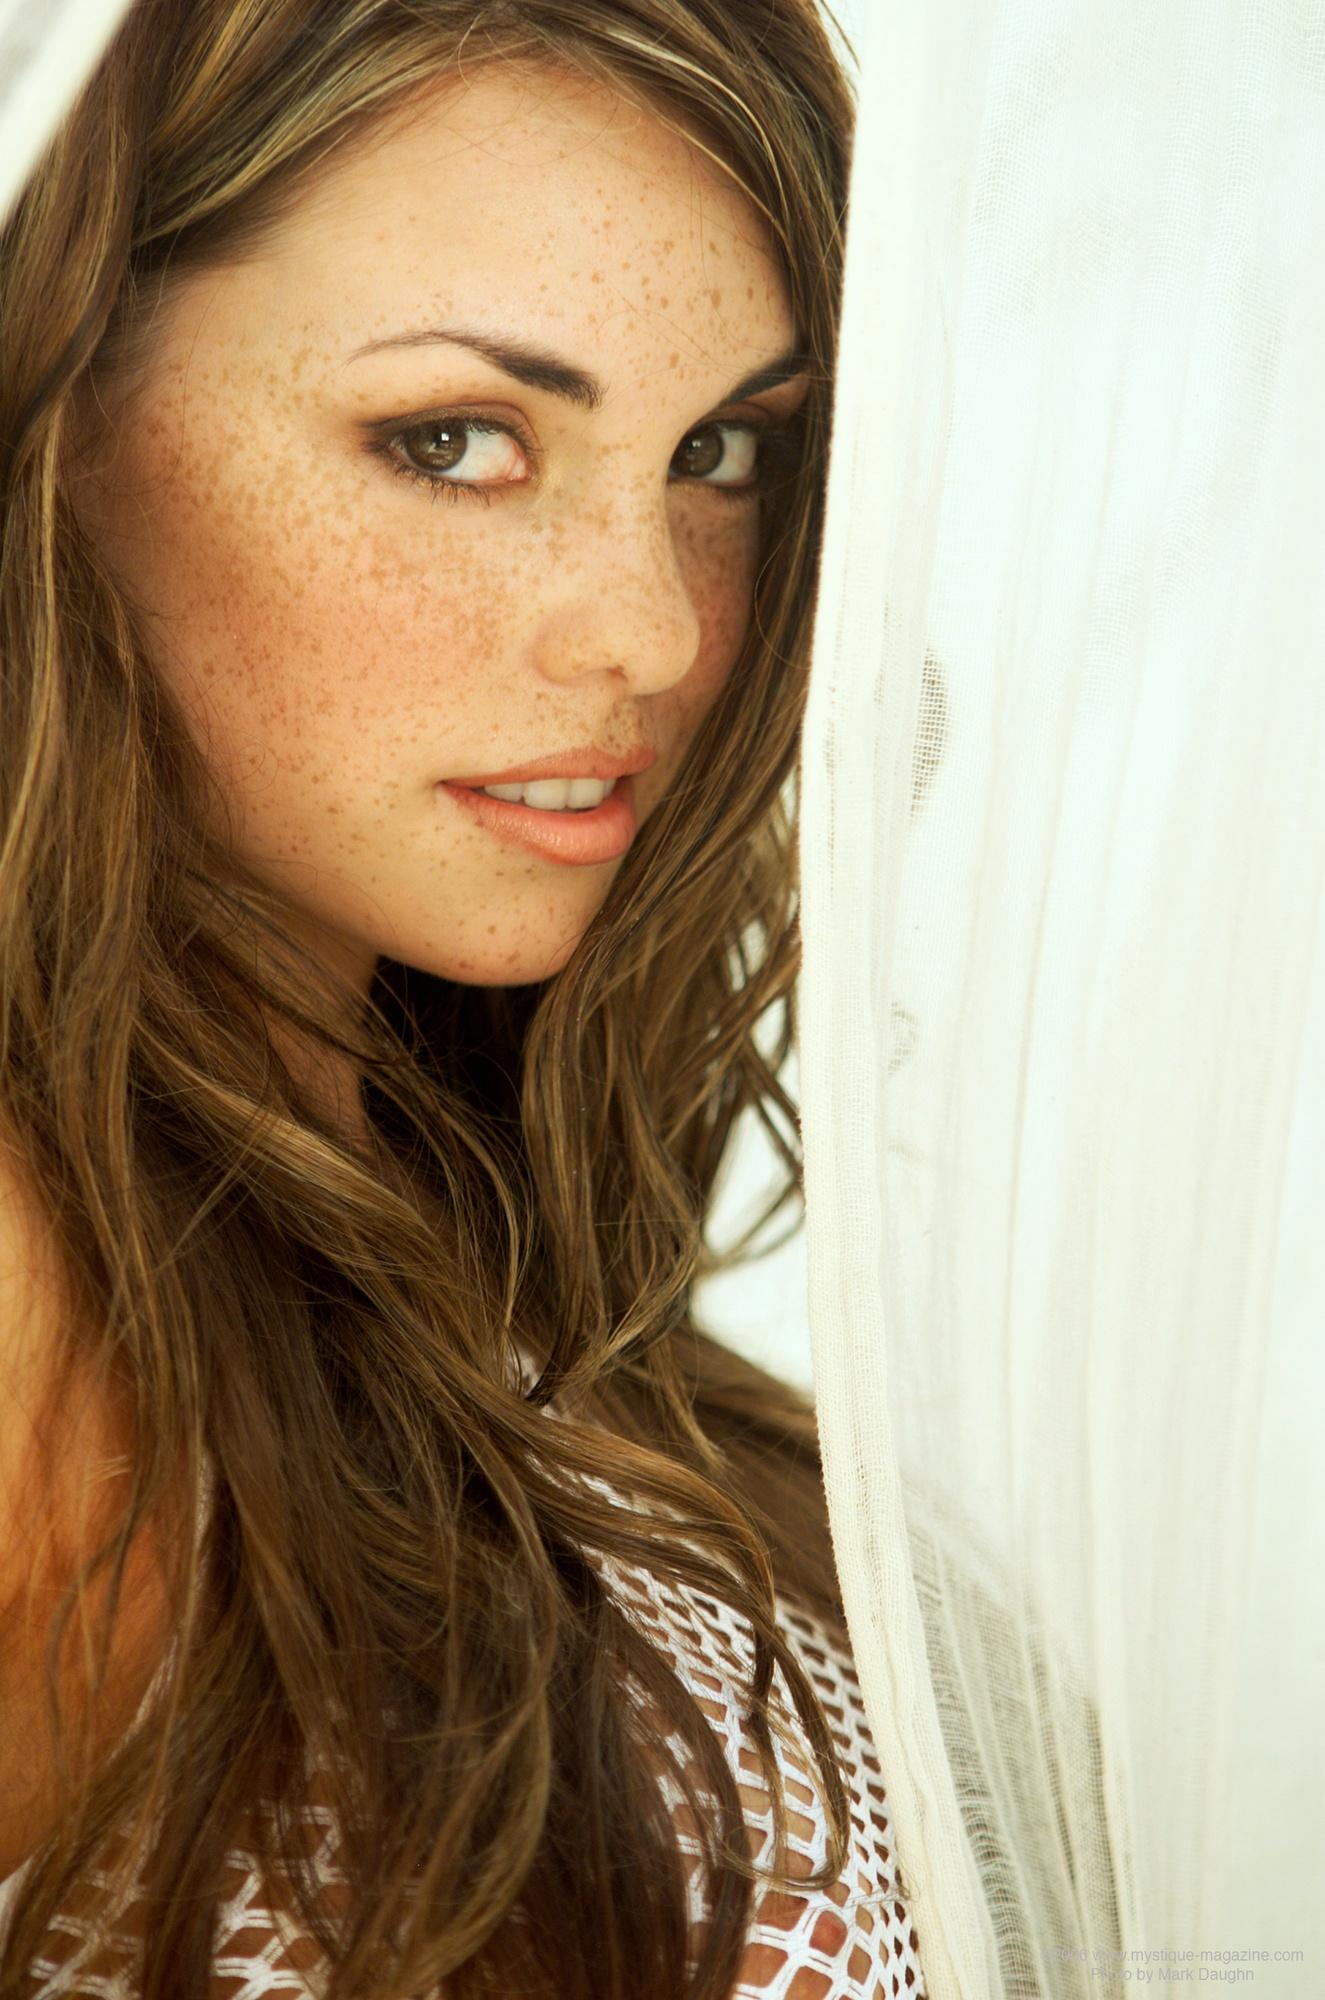 danielle-gamba-boobs-white-fishnet-nude-mystique-03